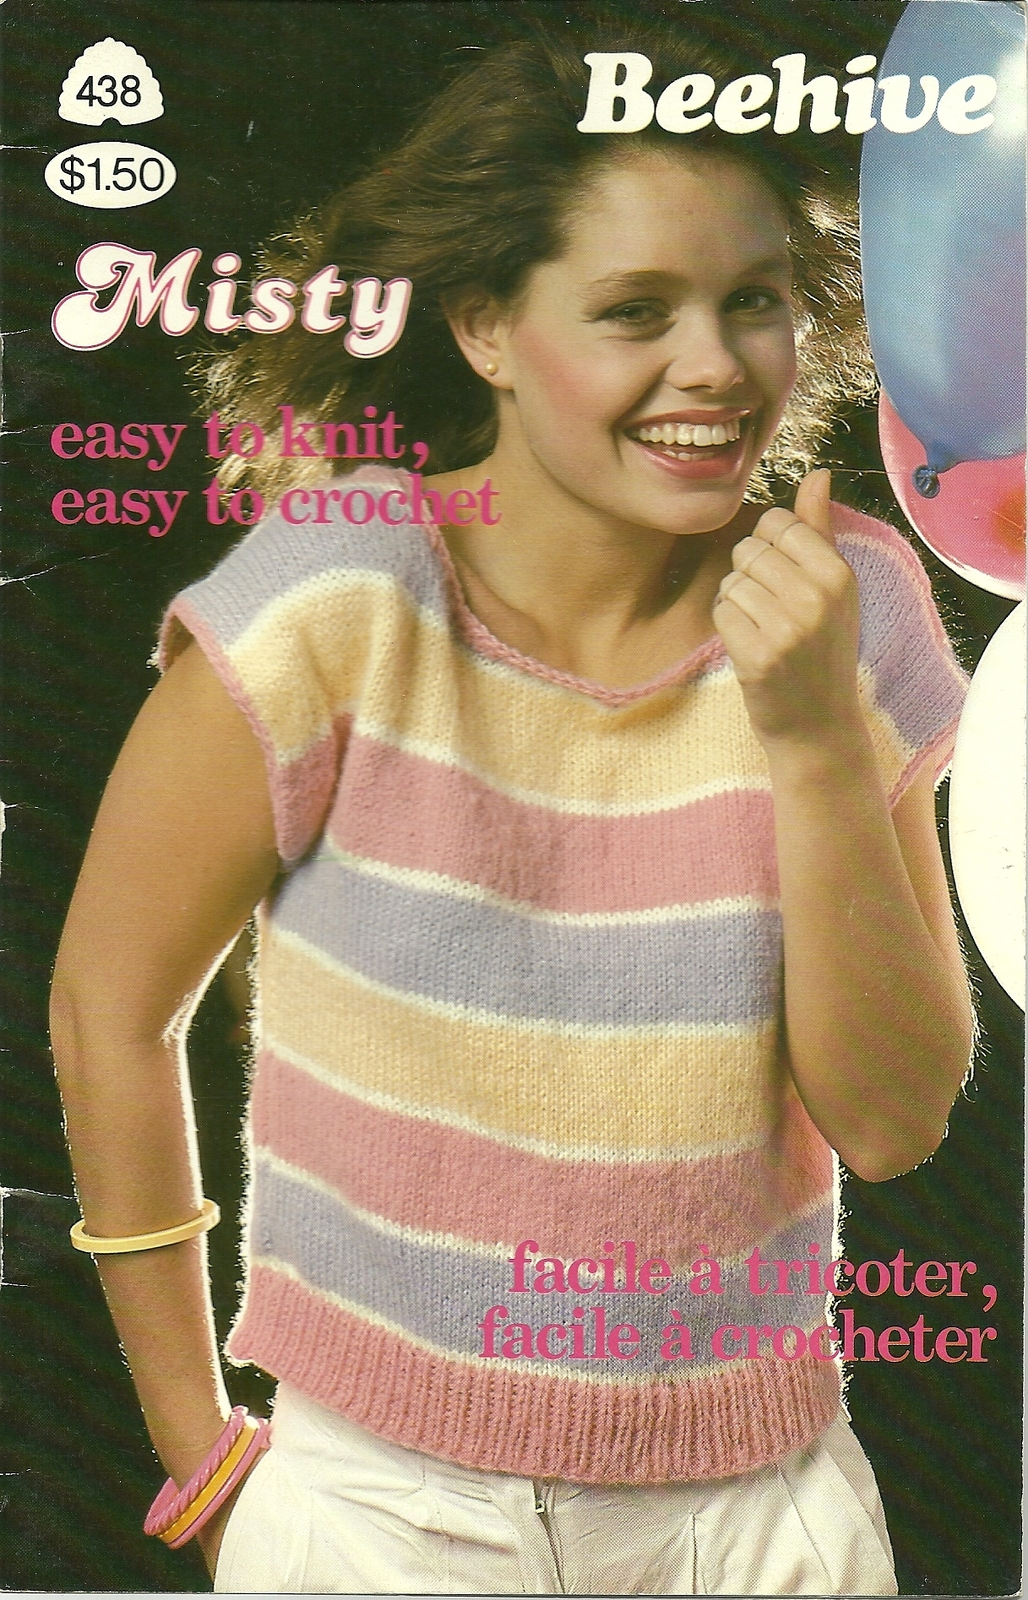 Beehive Misty Pattern Book 438 Knit Crochet Sweater Top Vest Collar Cardigan - $9.99